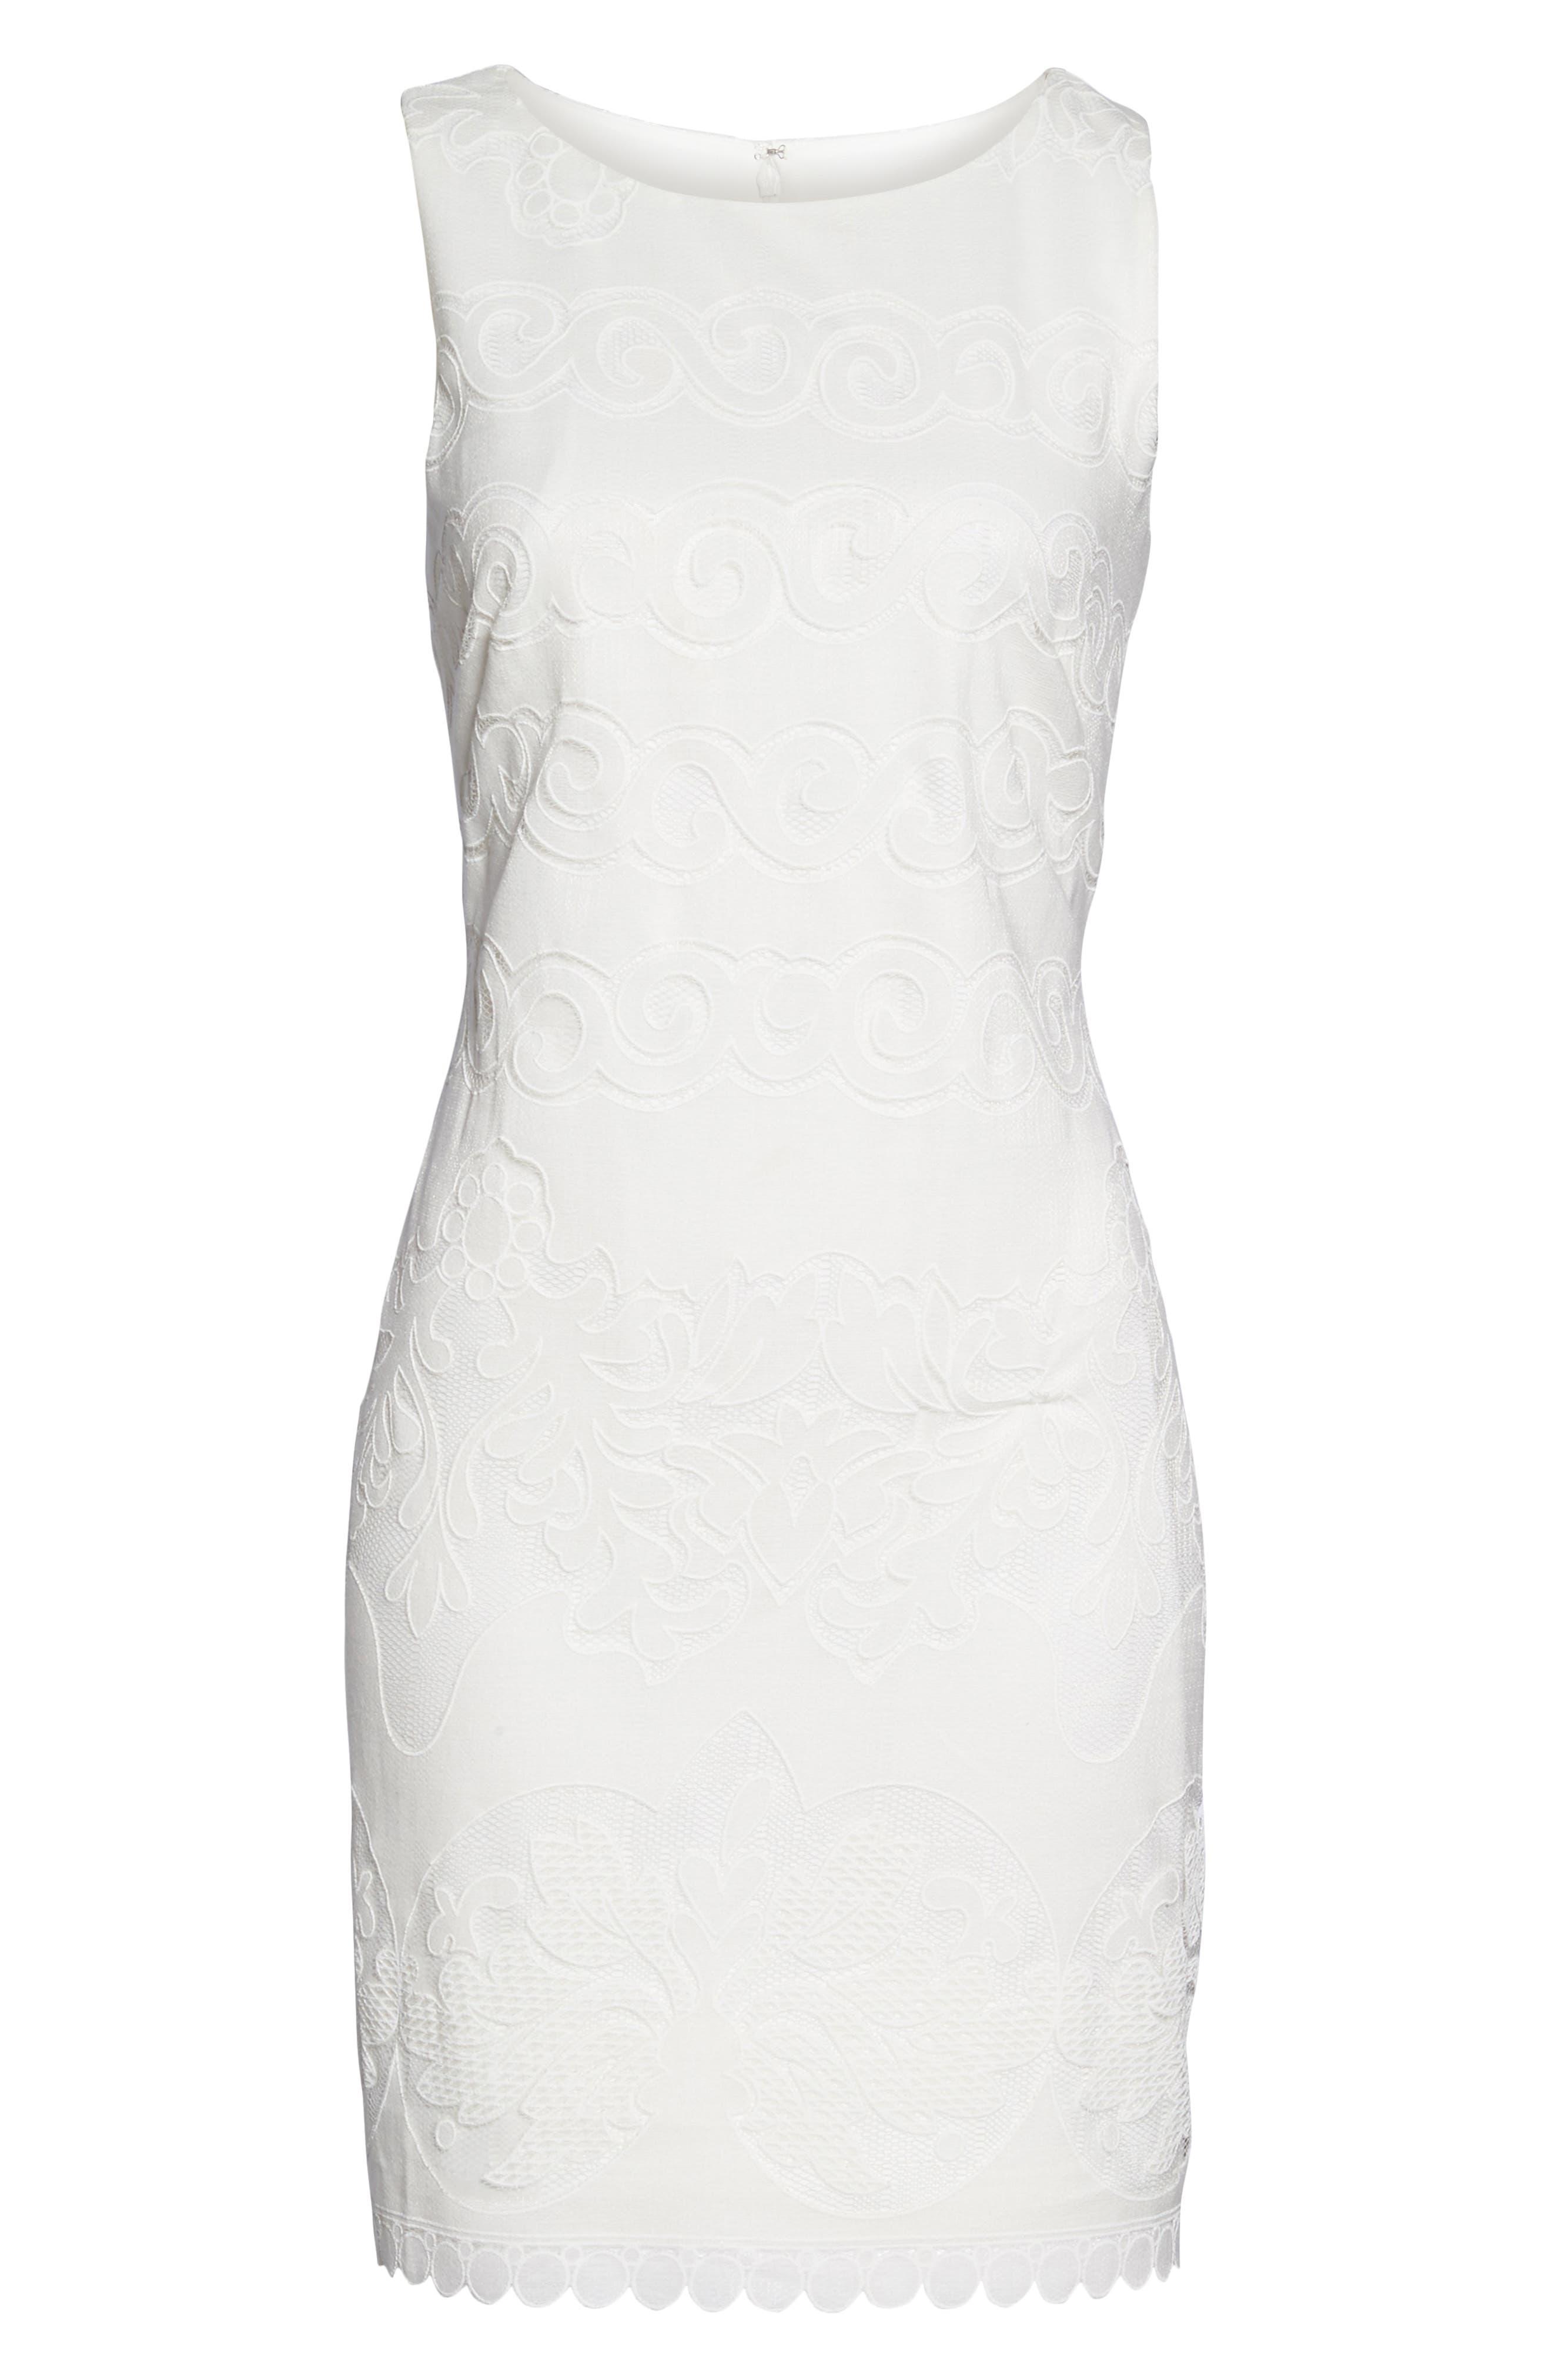 A-Line Dress,                             Alternate thumbnail 6, color,                             White